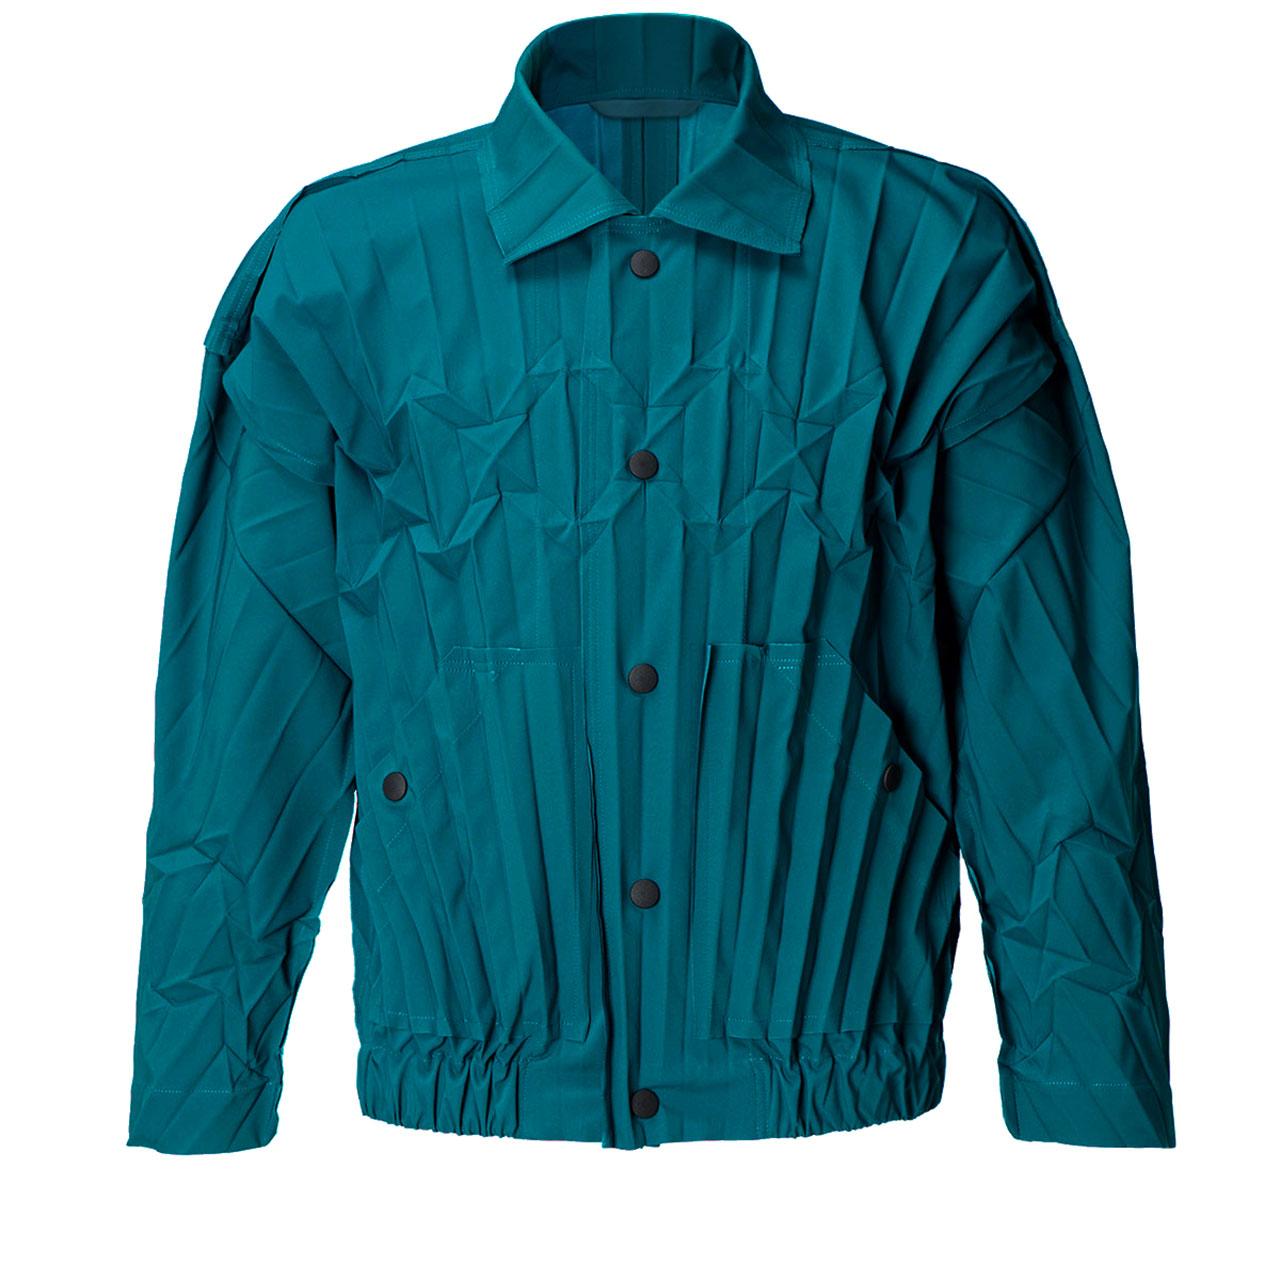 「EDGE BLOUSON (エッジ ブルゾン)」ブルー ¥38,000